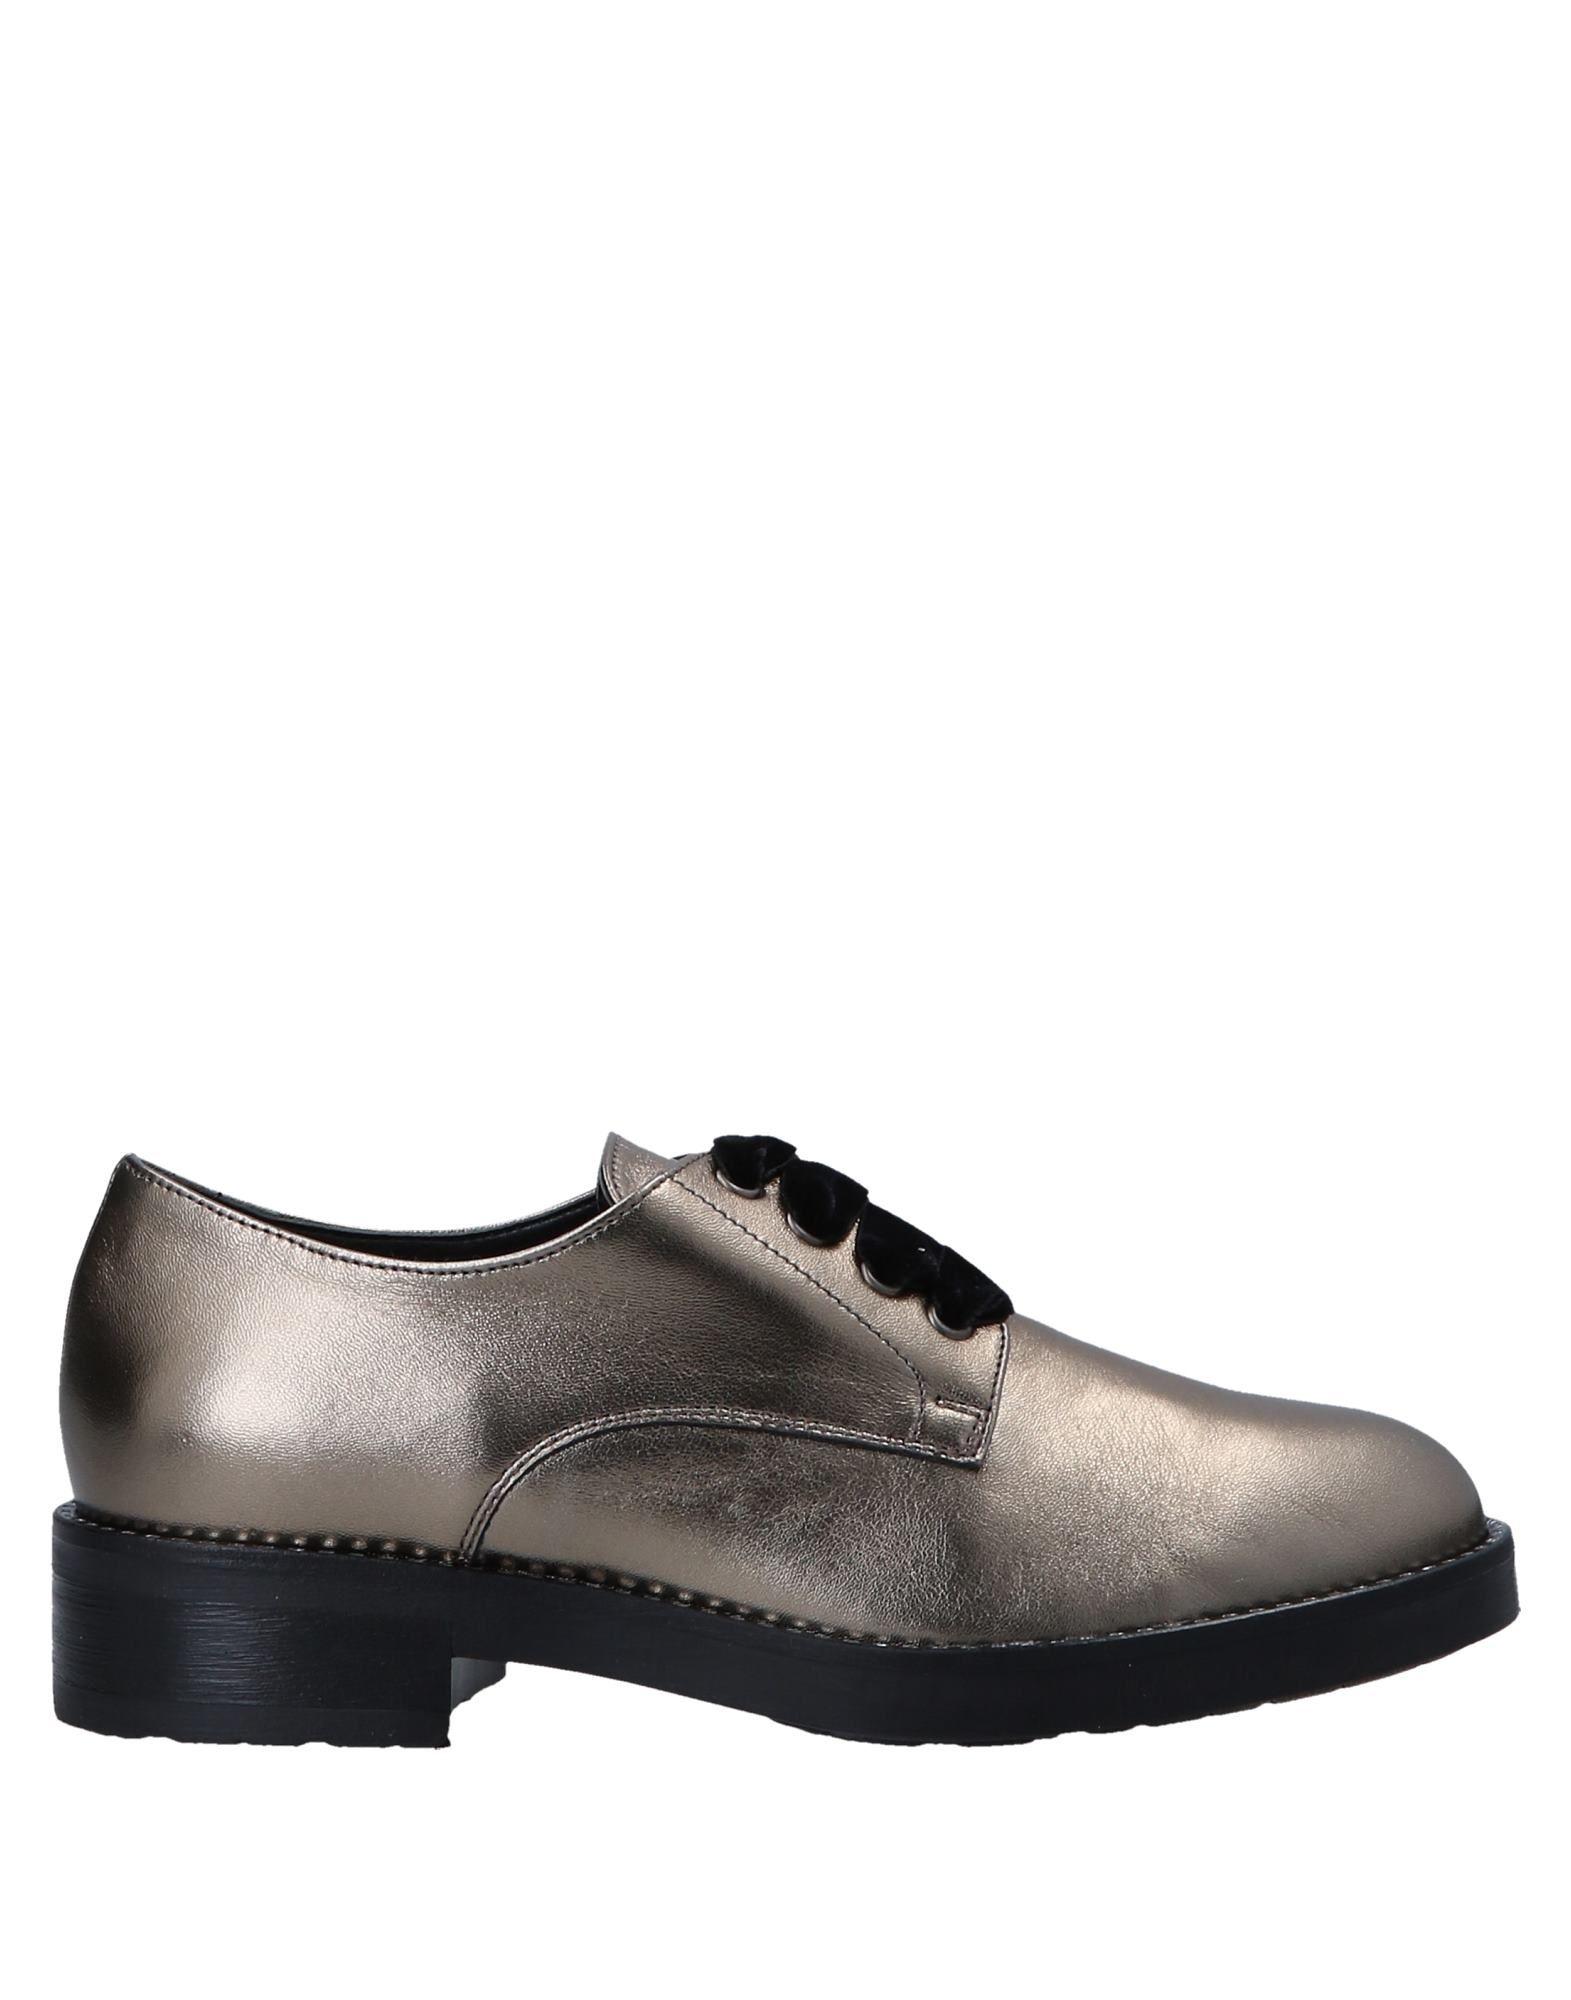 LORETTA by LORETTA Обувь на шнурках loretta by loretta обувь на шнурках